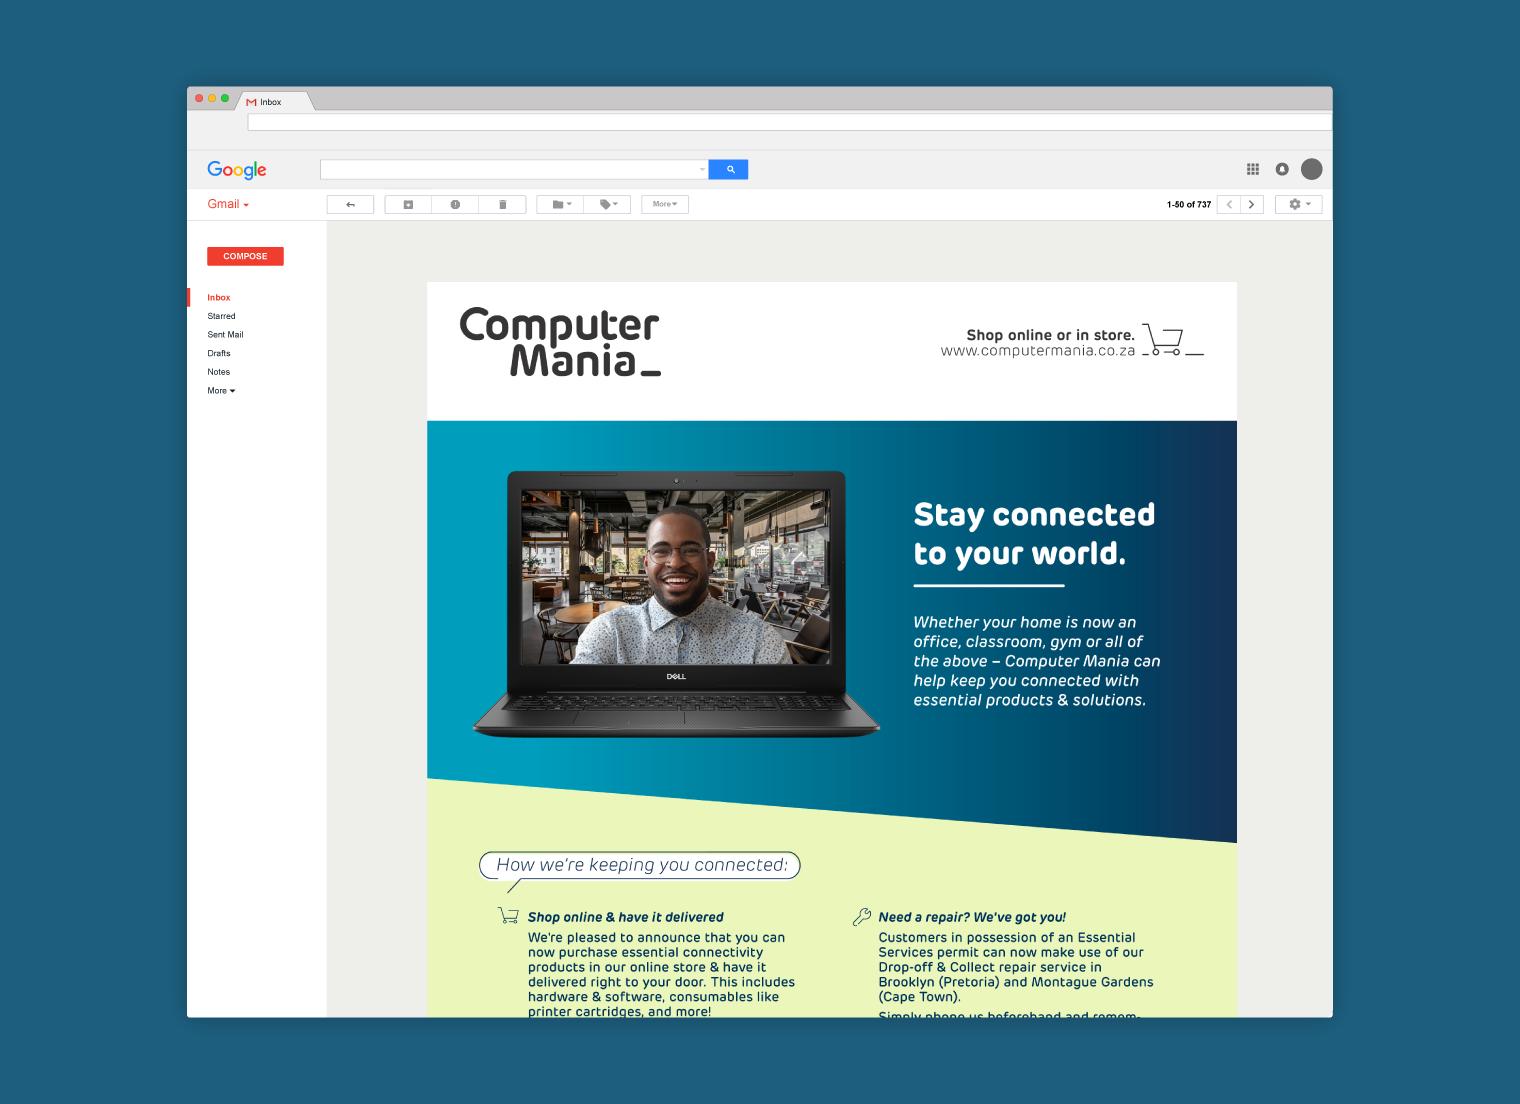 Emailer – Computer Mania